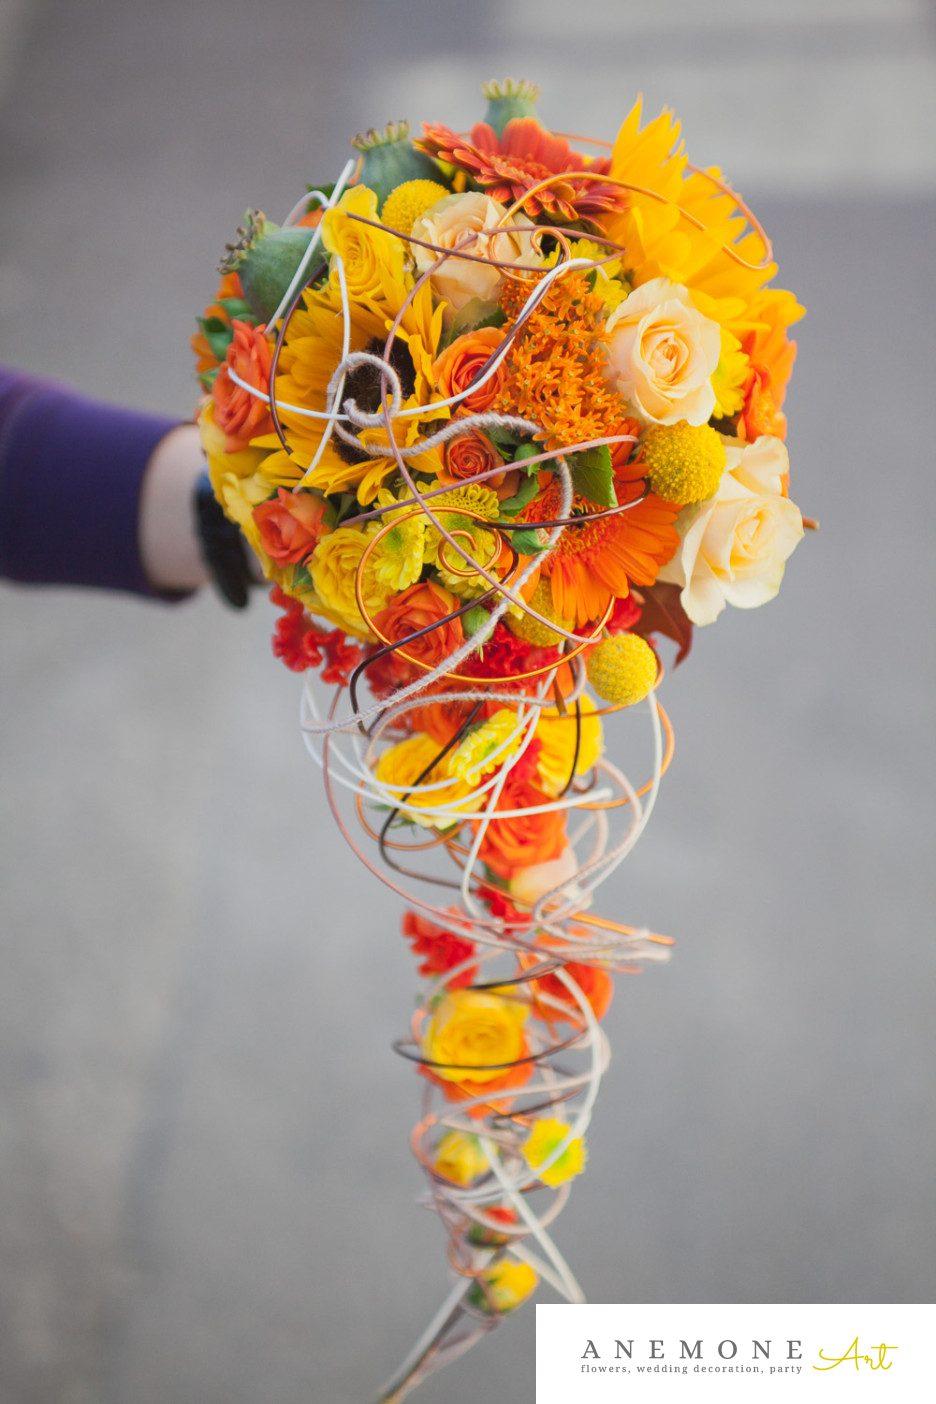 Poza, foto cu Flori de nunta buchet mireasa, celosia, craspedia, curgator, floarea soarelui, galben, mini-gerbera, mini-rosa, portocaliu, trandafiri in Arad, Timisoara, Oradea (wedding flowers, bouquets) nunta Arad, Timisoara, Oradea